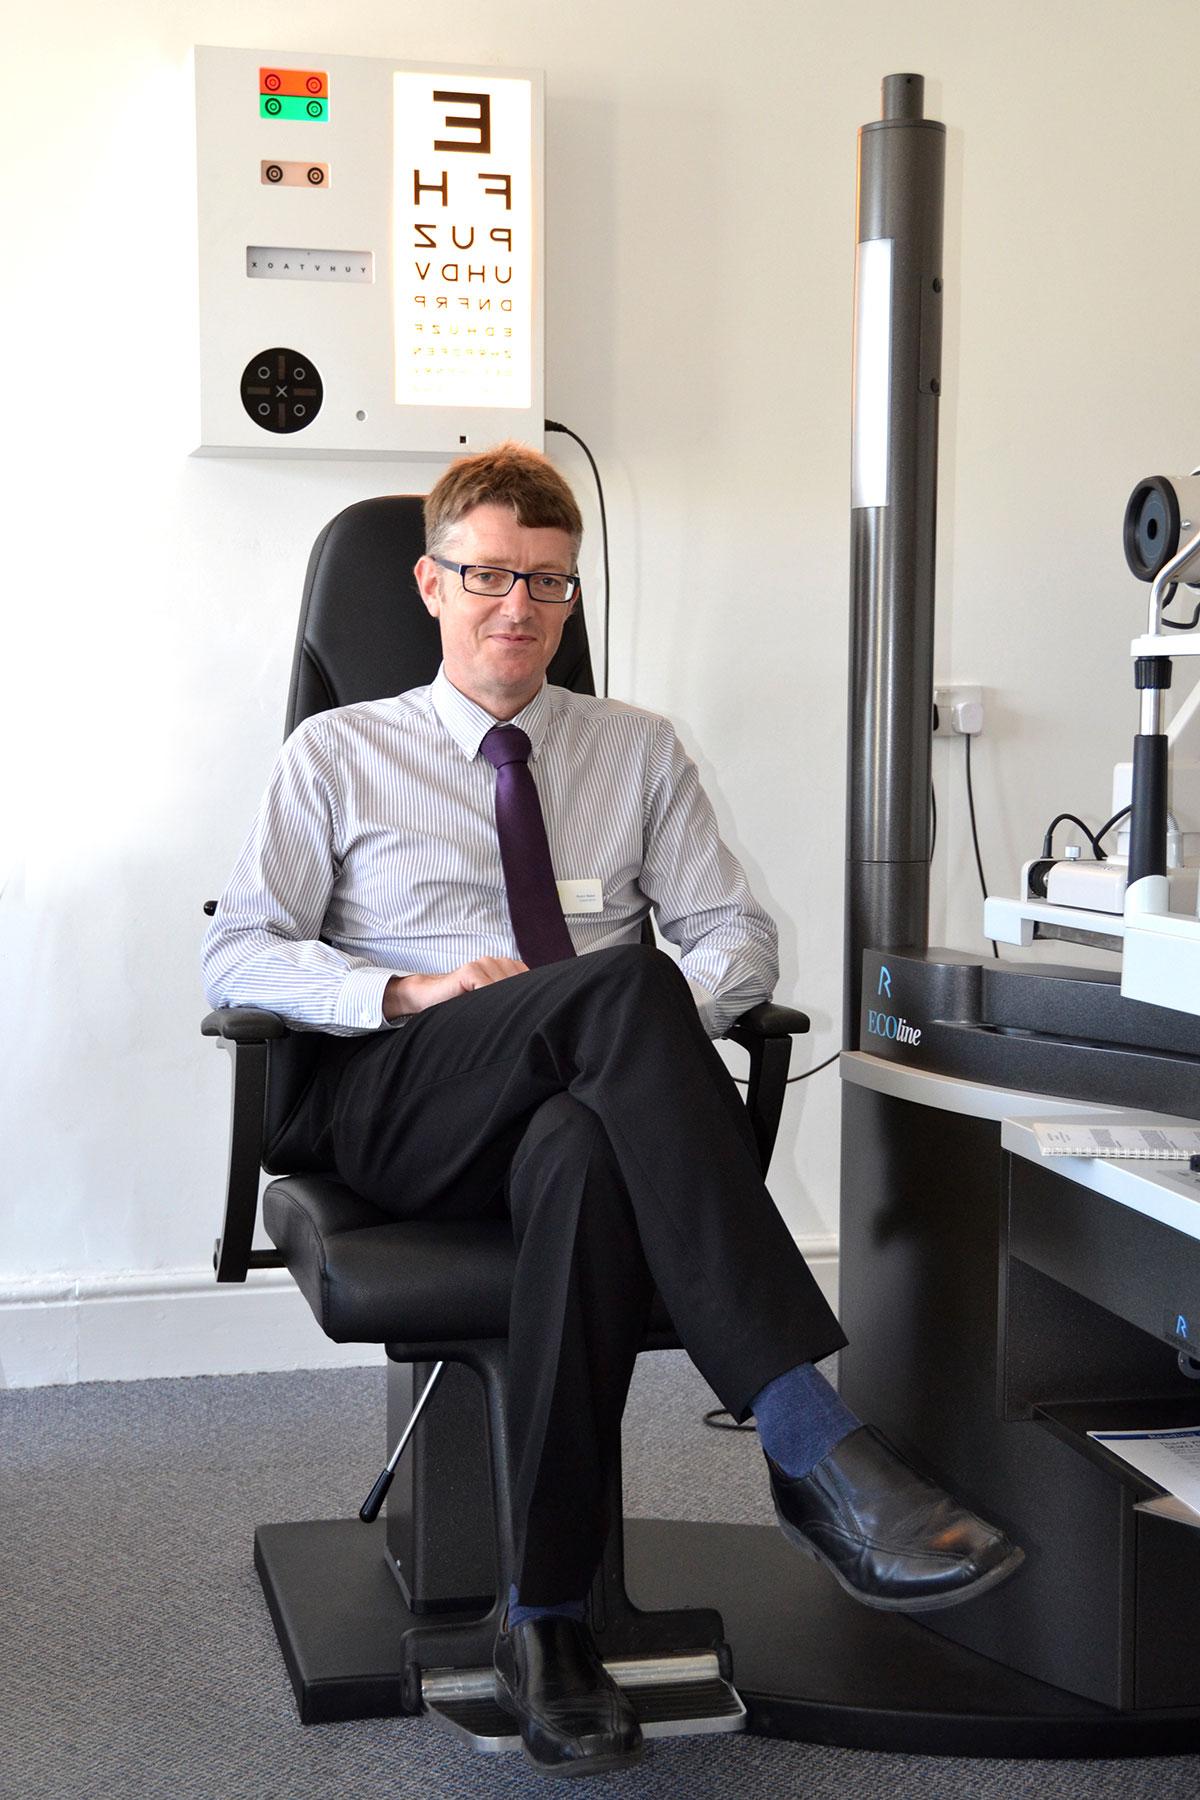 Robin Baker BSc (Hons), MCOptom, Optometrist